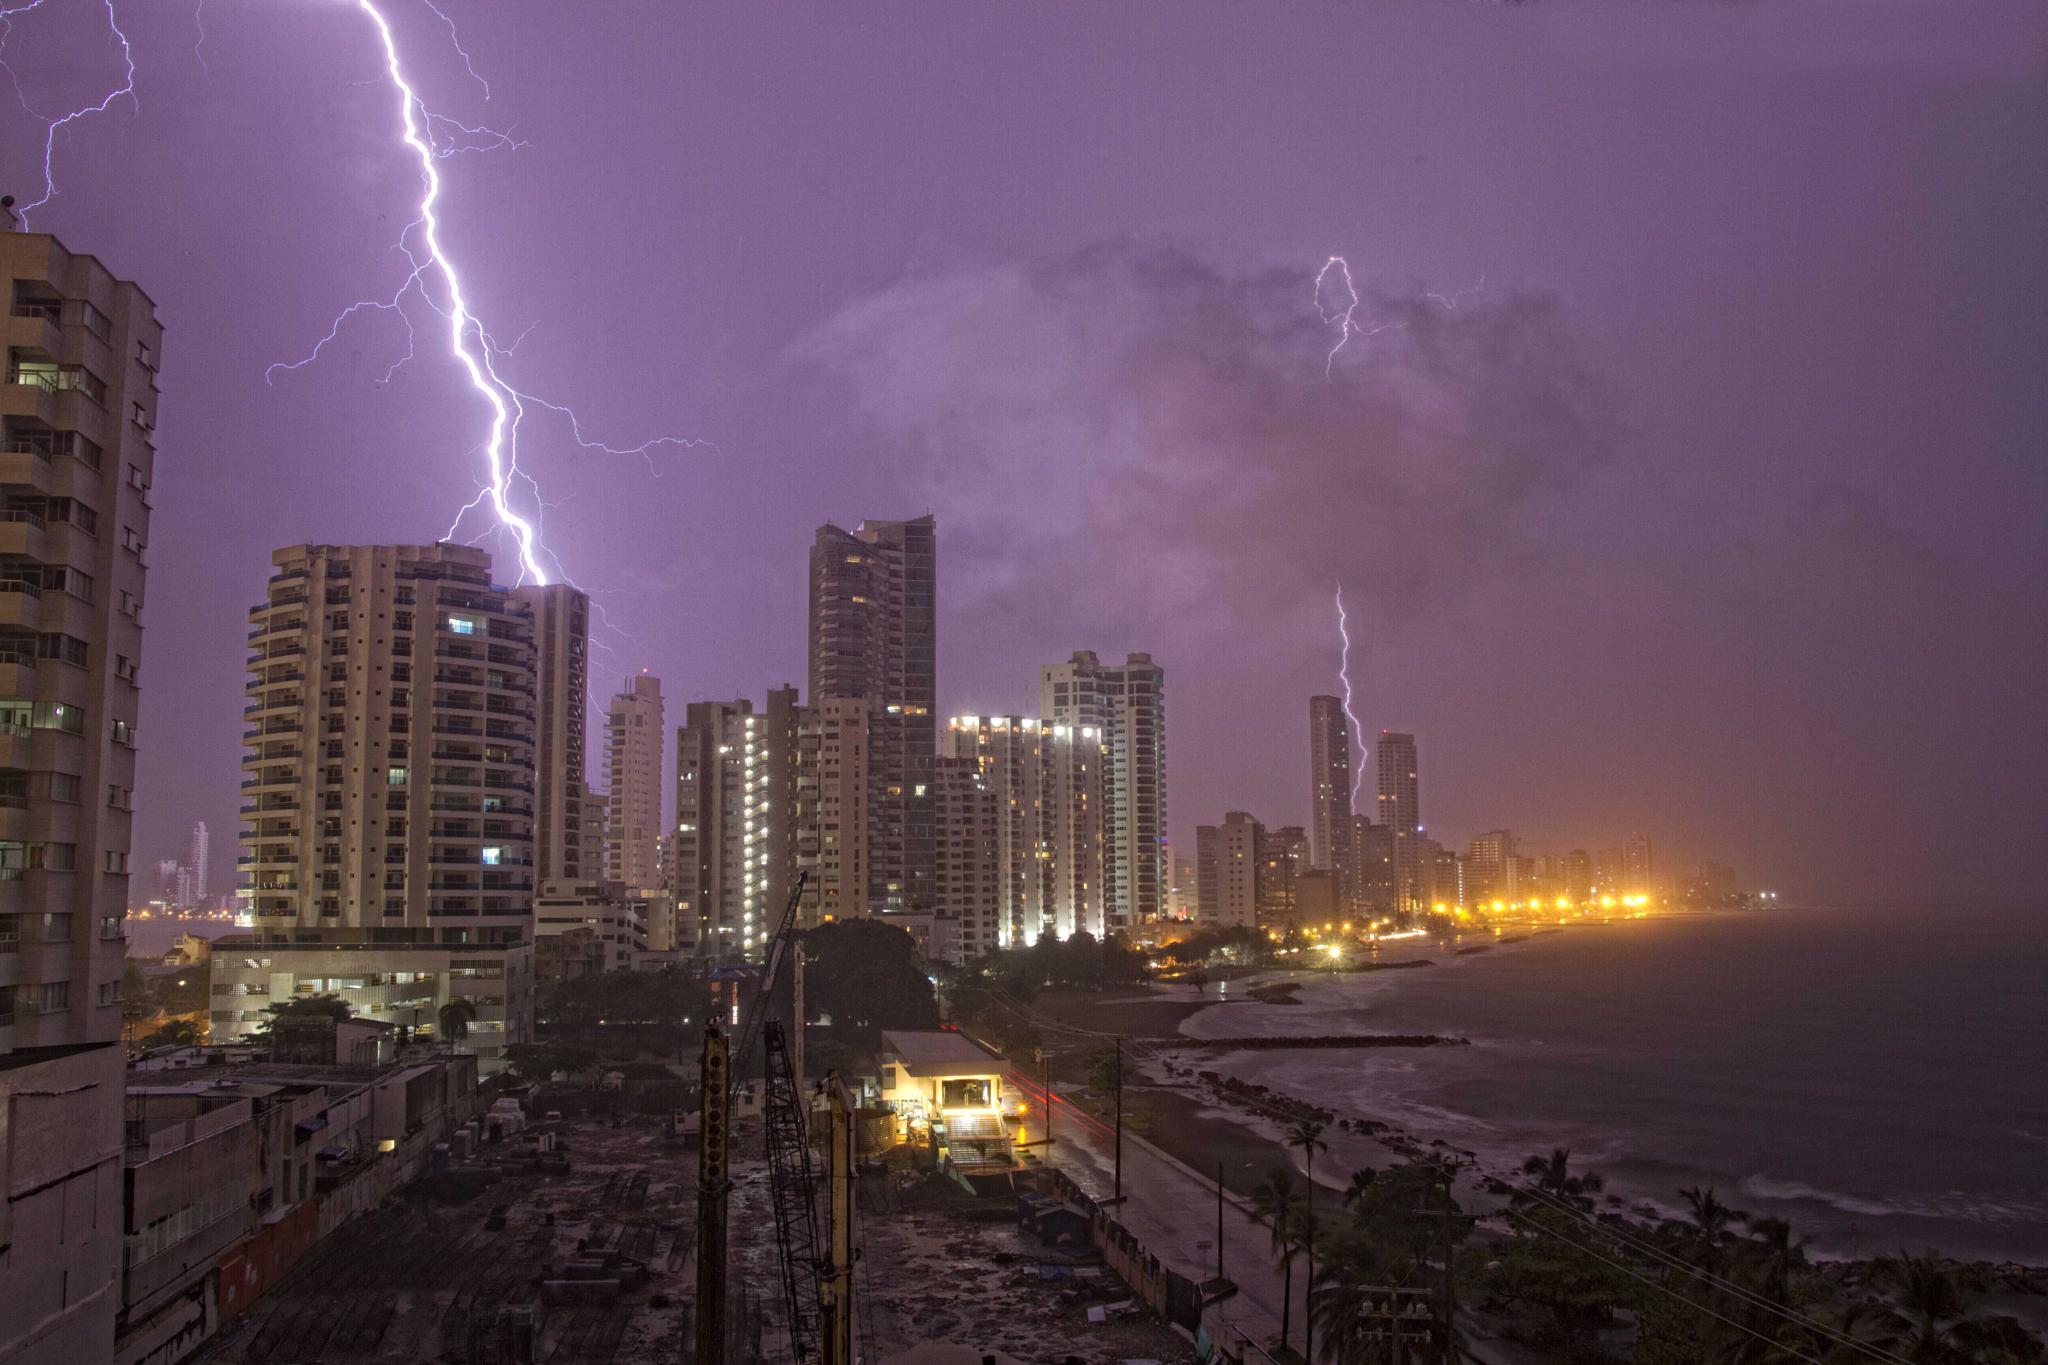 City storm by JOSE O. CABALLERO HERNANDEZ